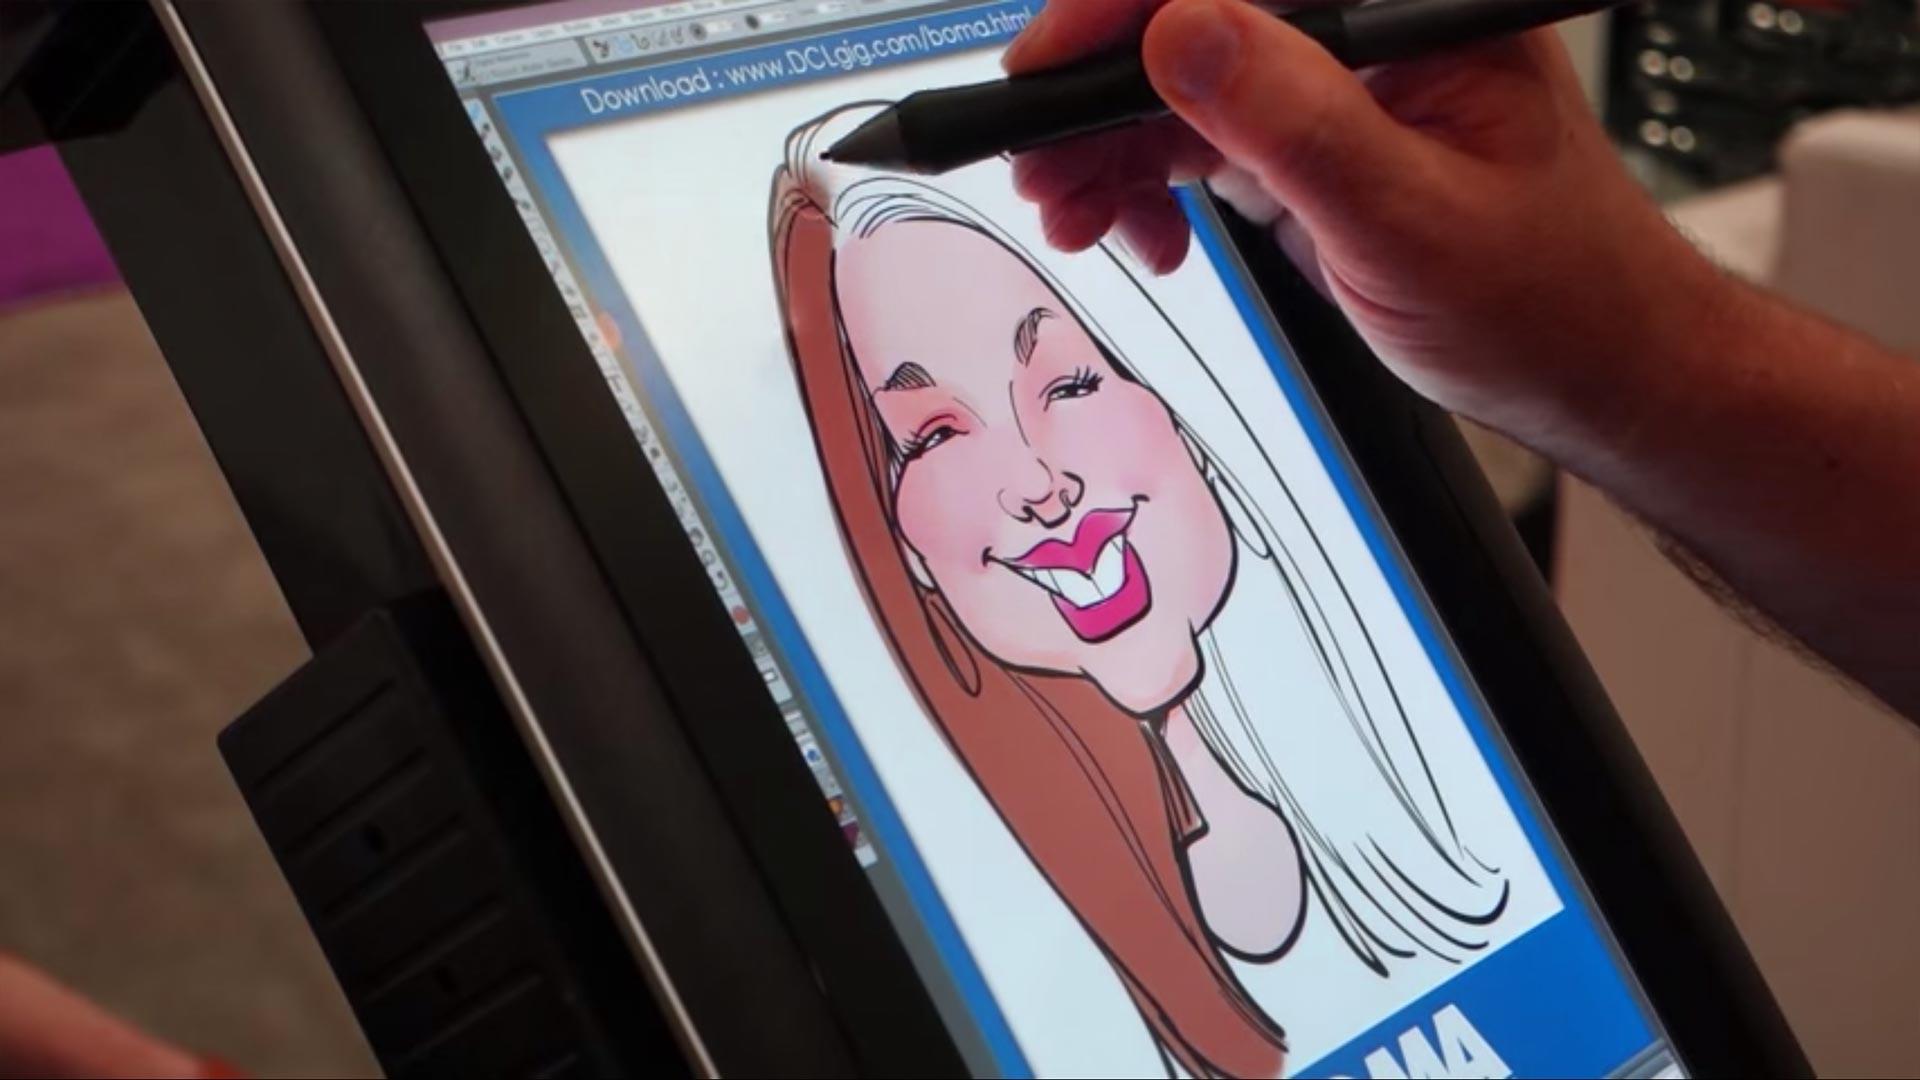 Virtual Cartoon Artist (Caricaturist)